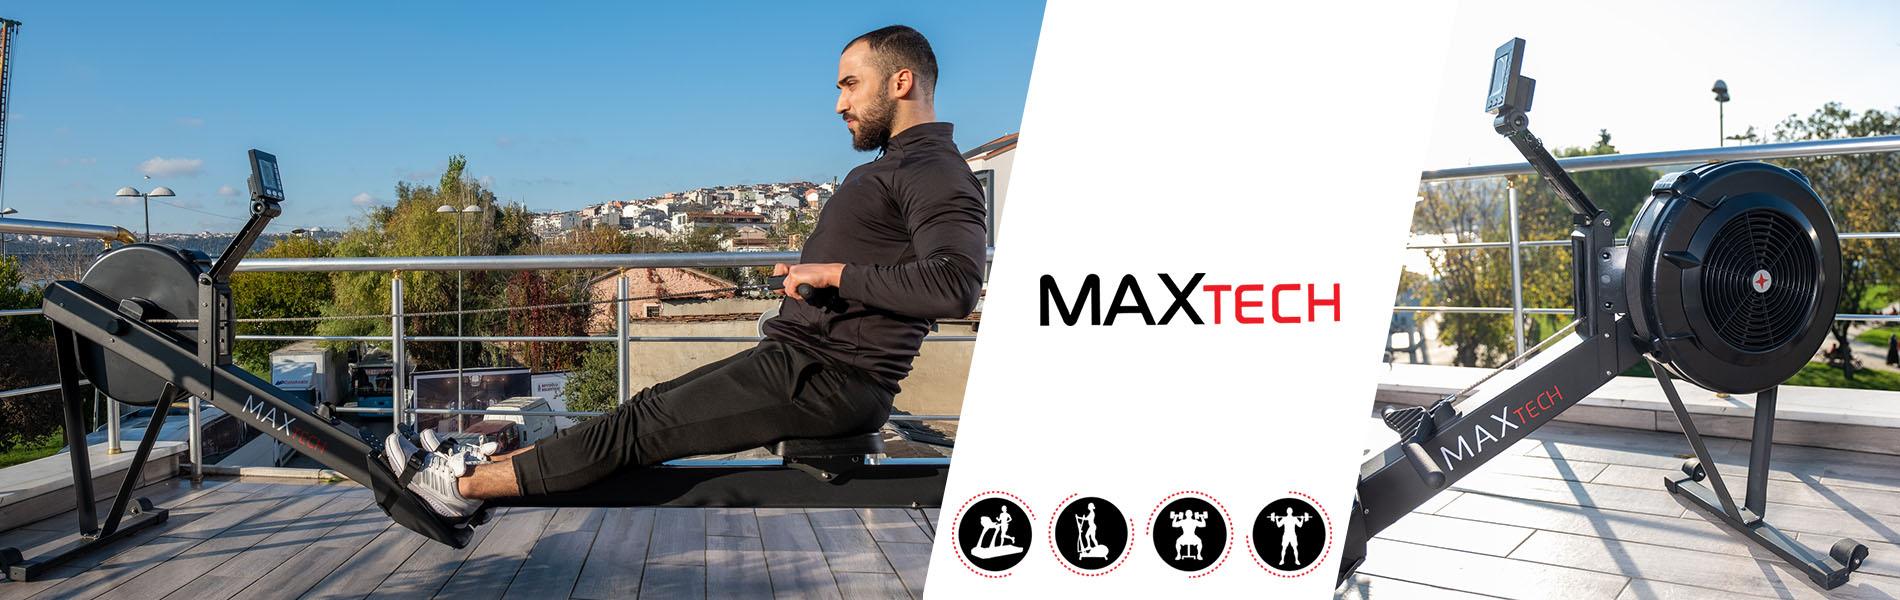 maxtech-fitness-ekipmanlari-sl-2021-2